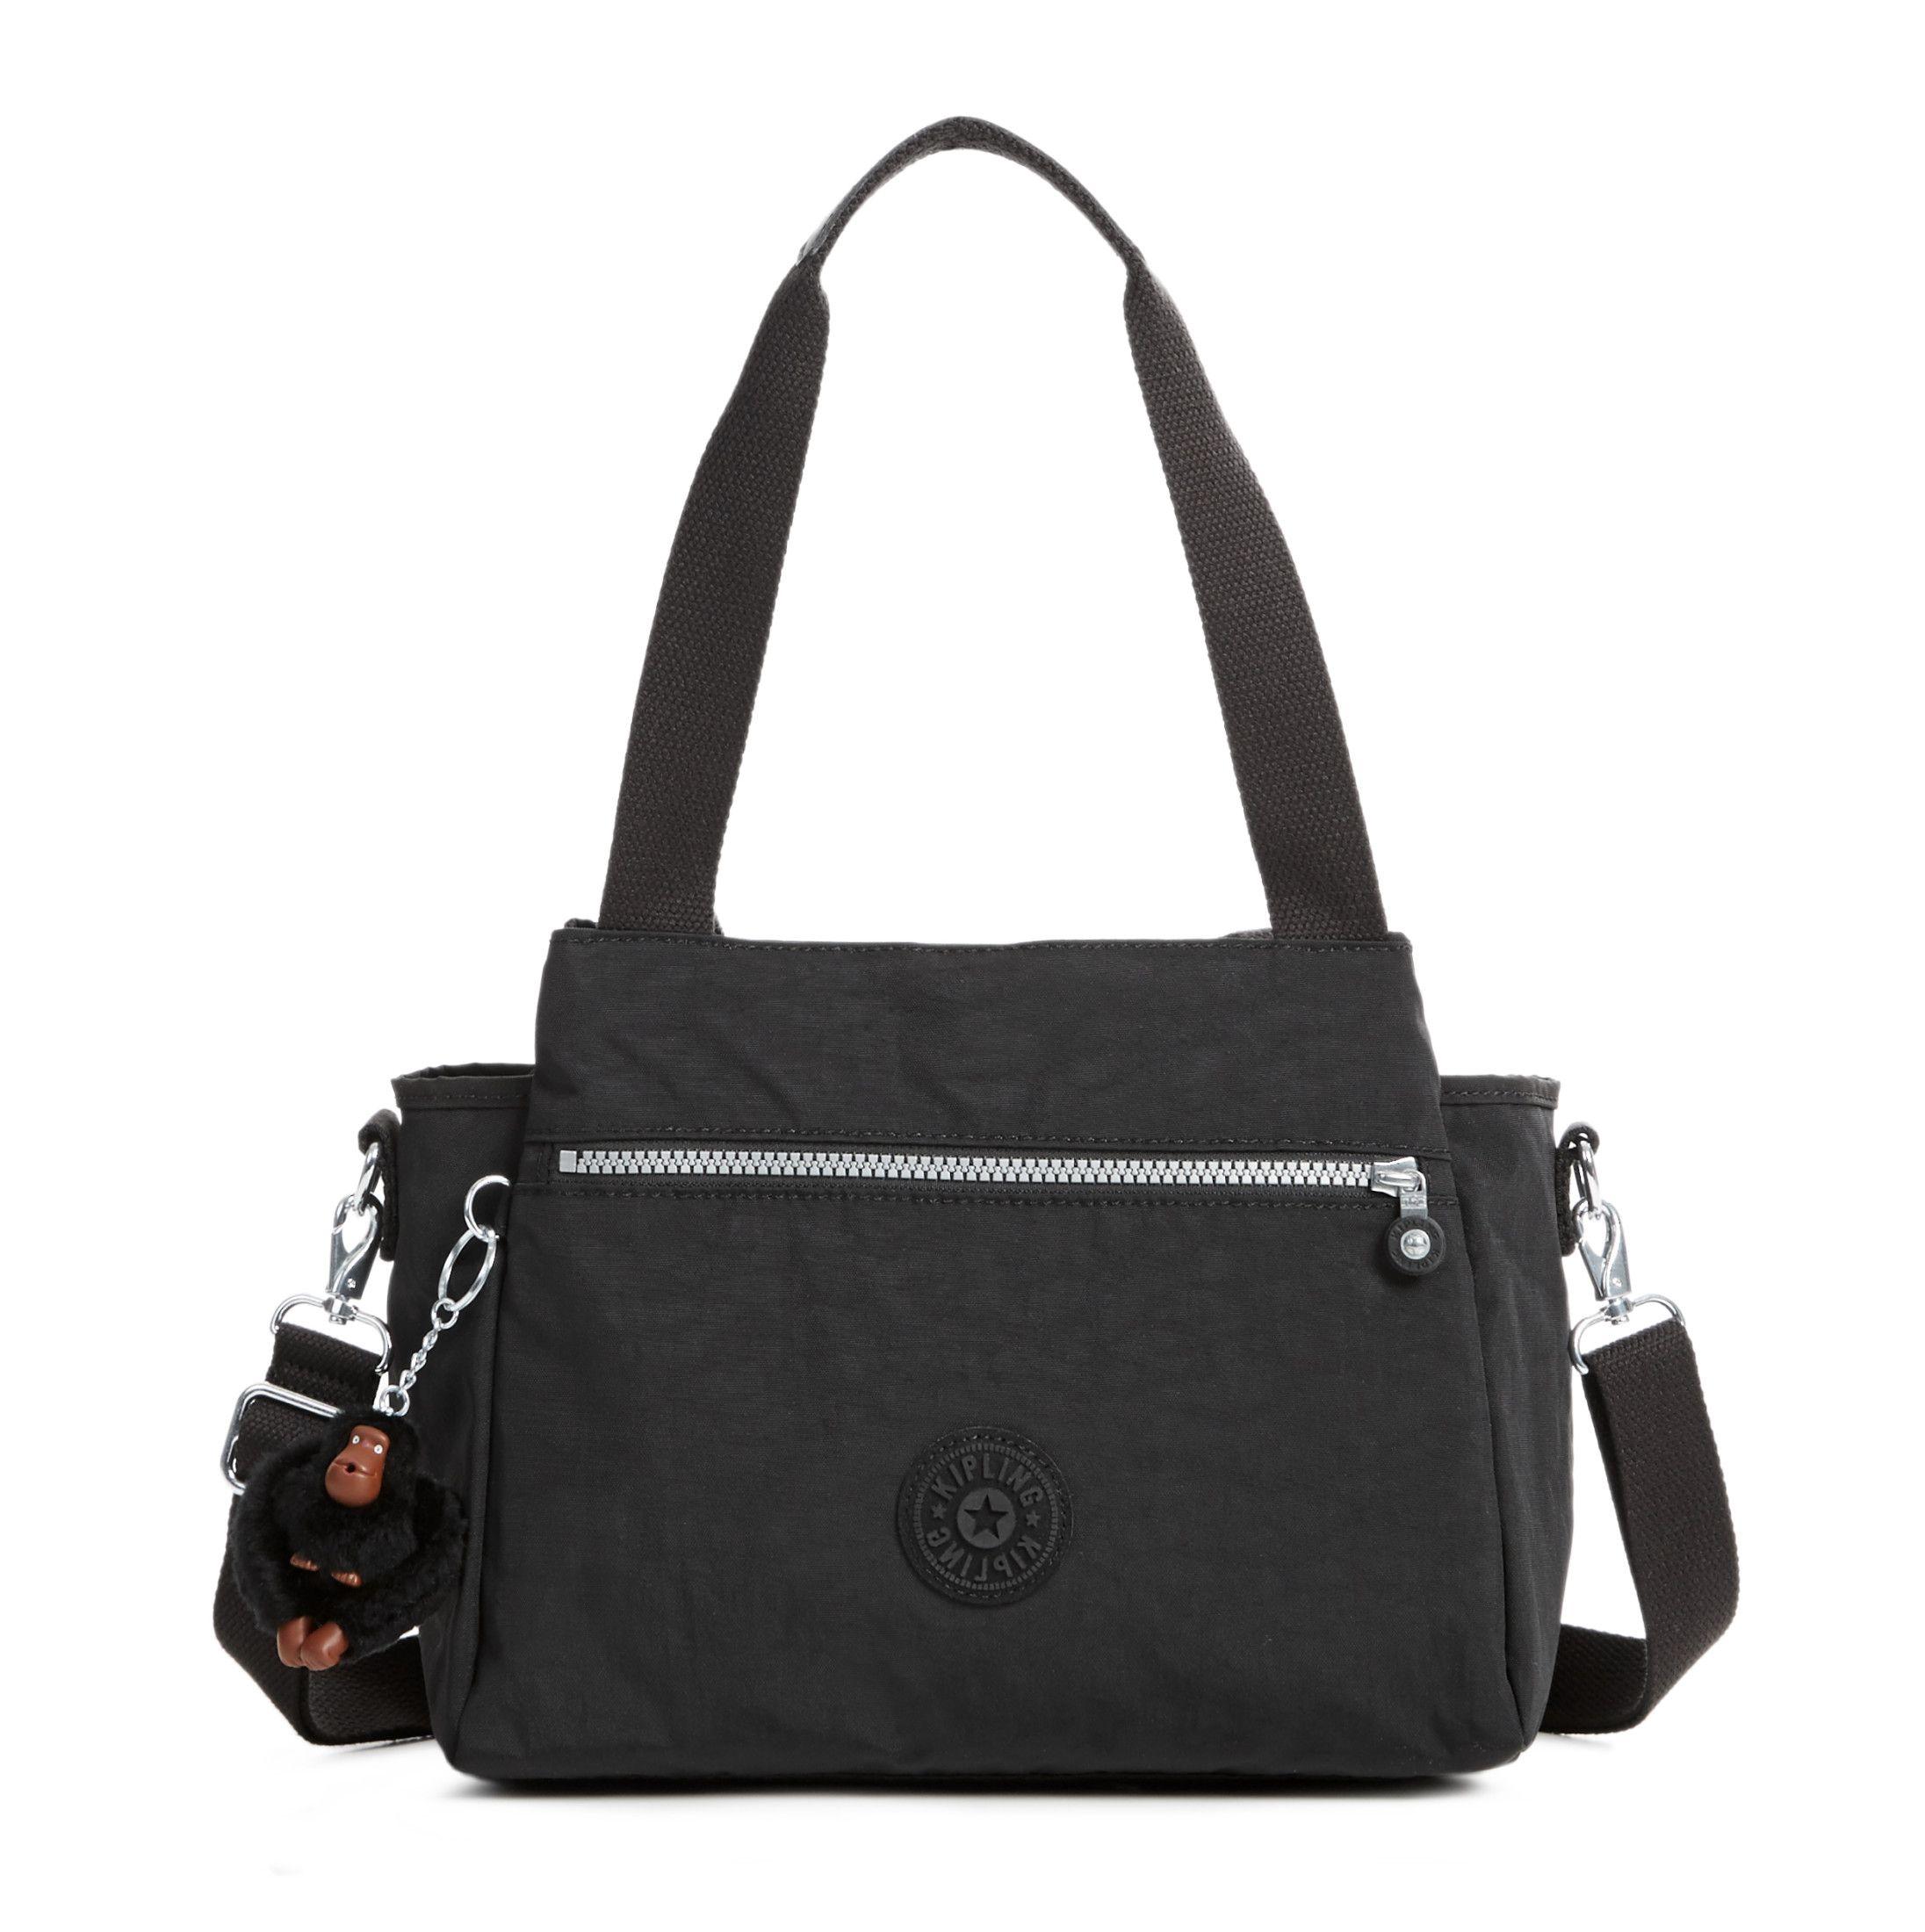 Elysia handbag crossbody bag satchel black cross body bag